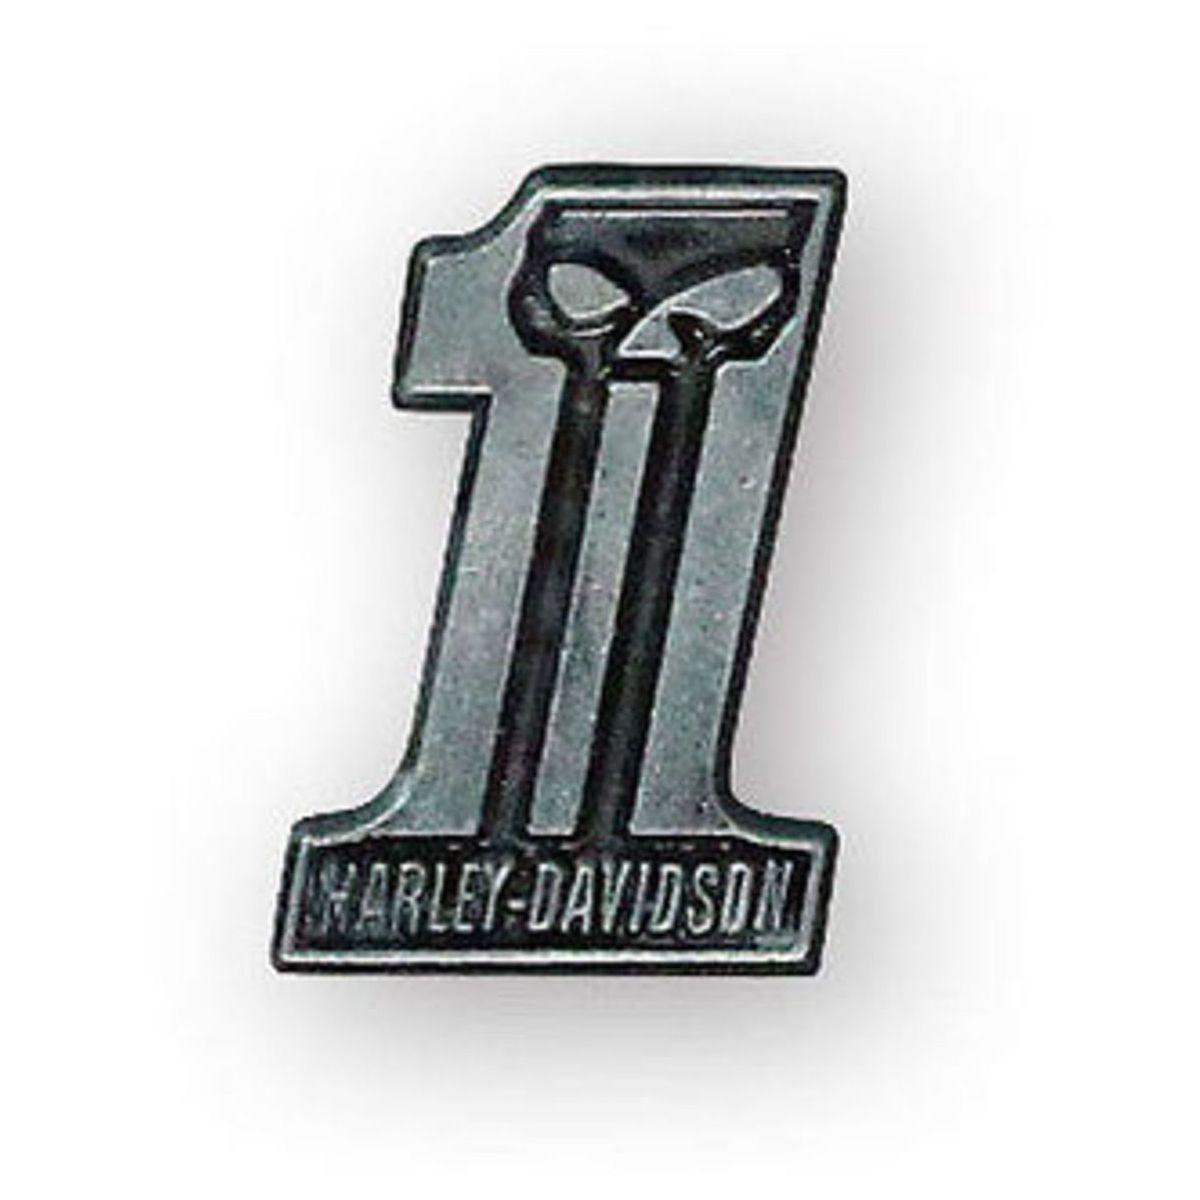 HARLEY DAVIDSON PIN, #1 SKULL, BLACK ANTIQUED NICKEL